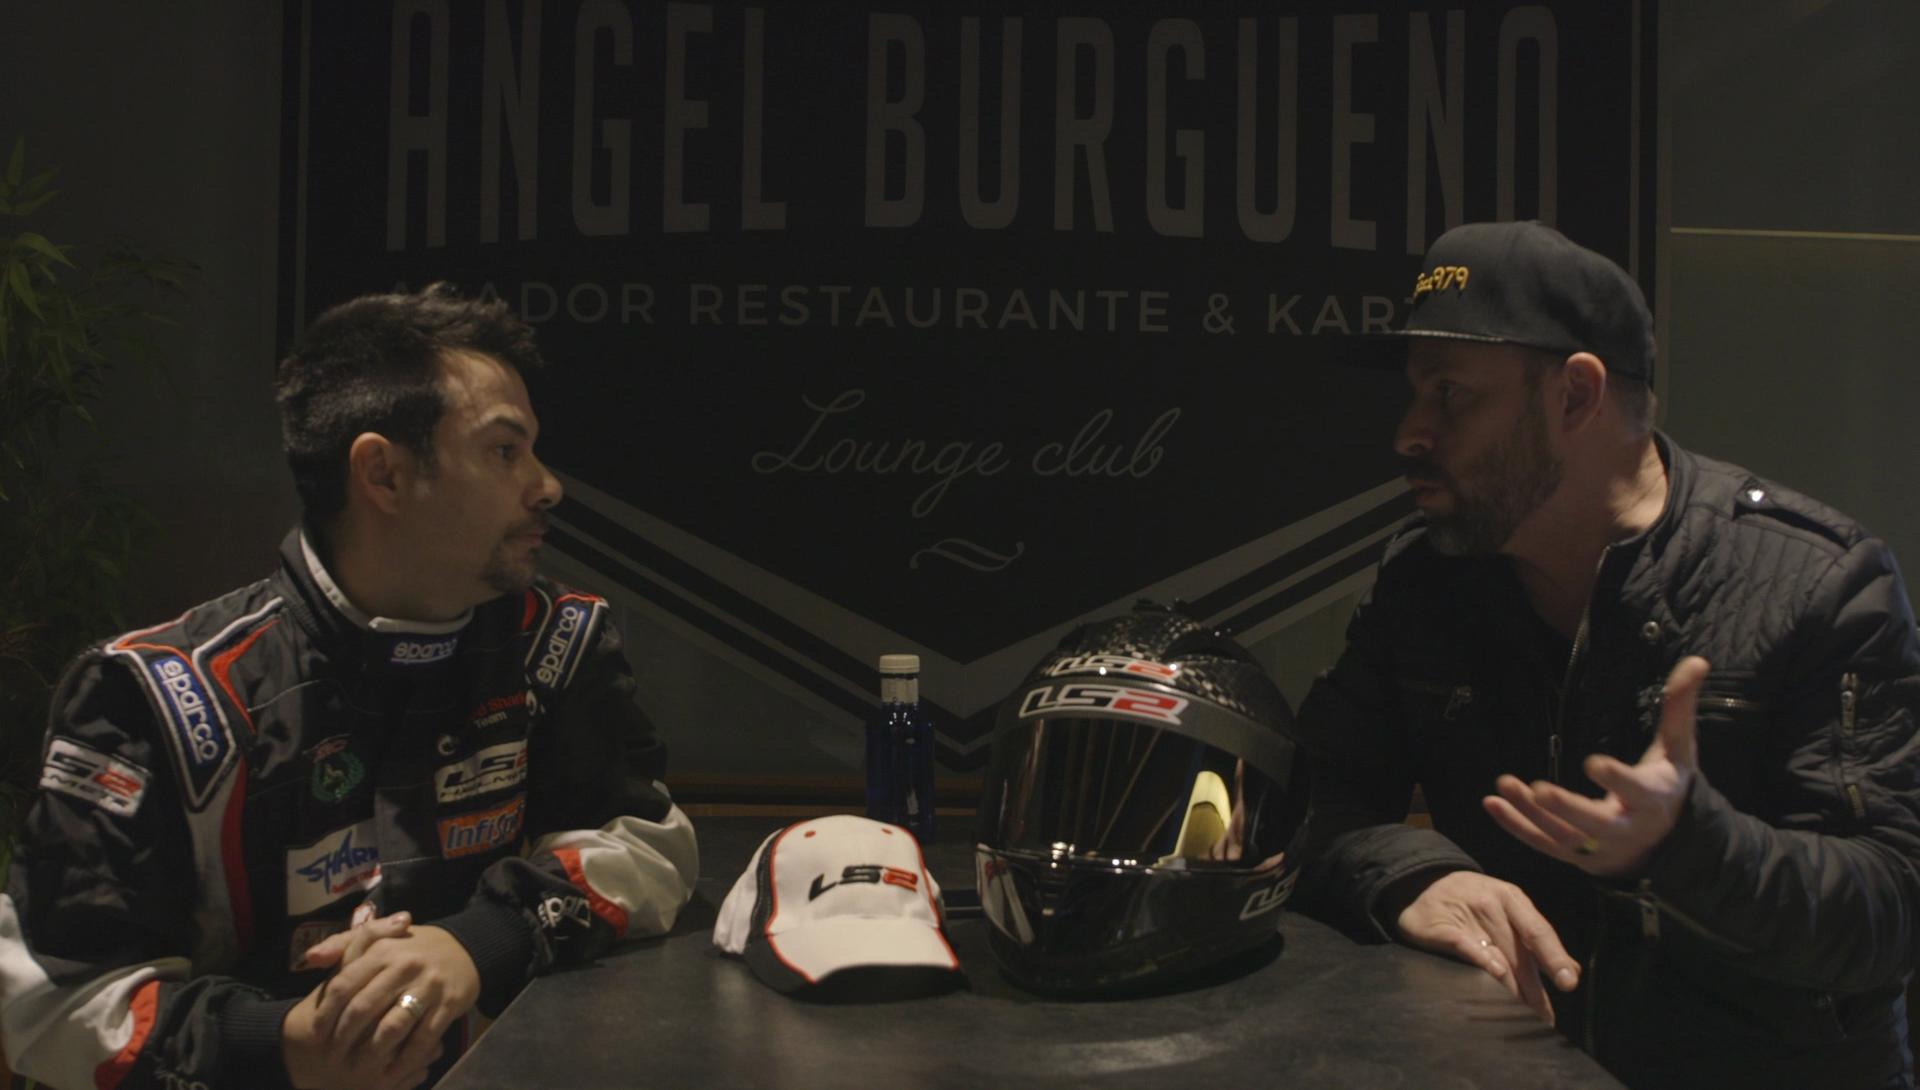 Entrevista Jorge pérez | Karting Ángel Burgueño GP2 CKRC 2017 | Arttica979 | El arte de lo extremo.